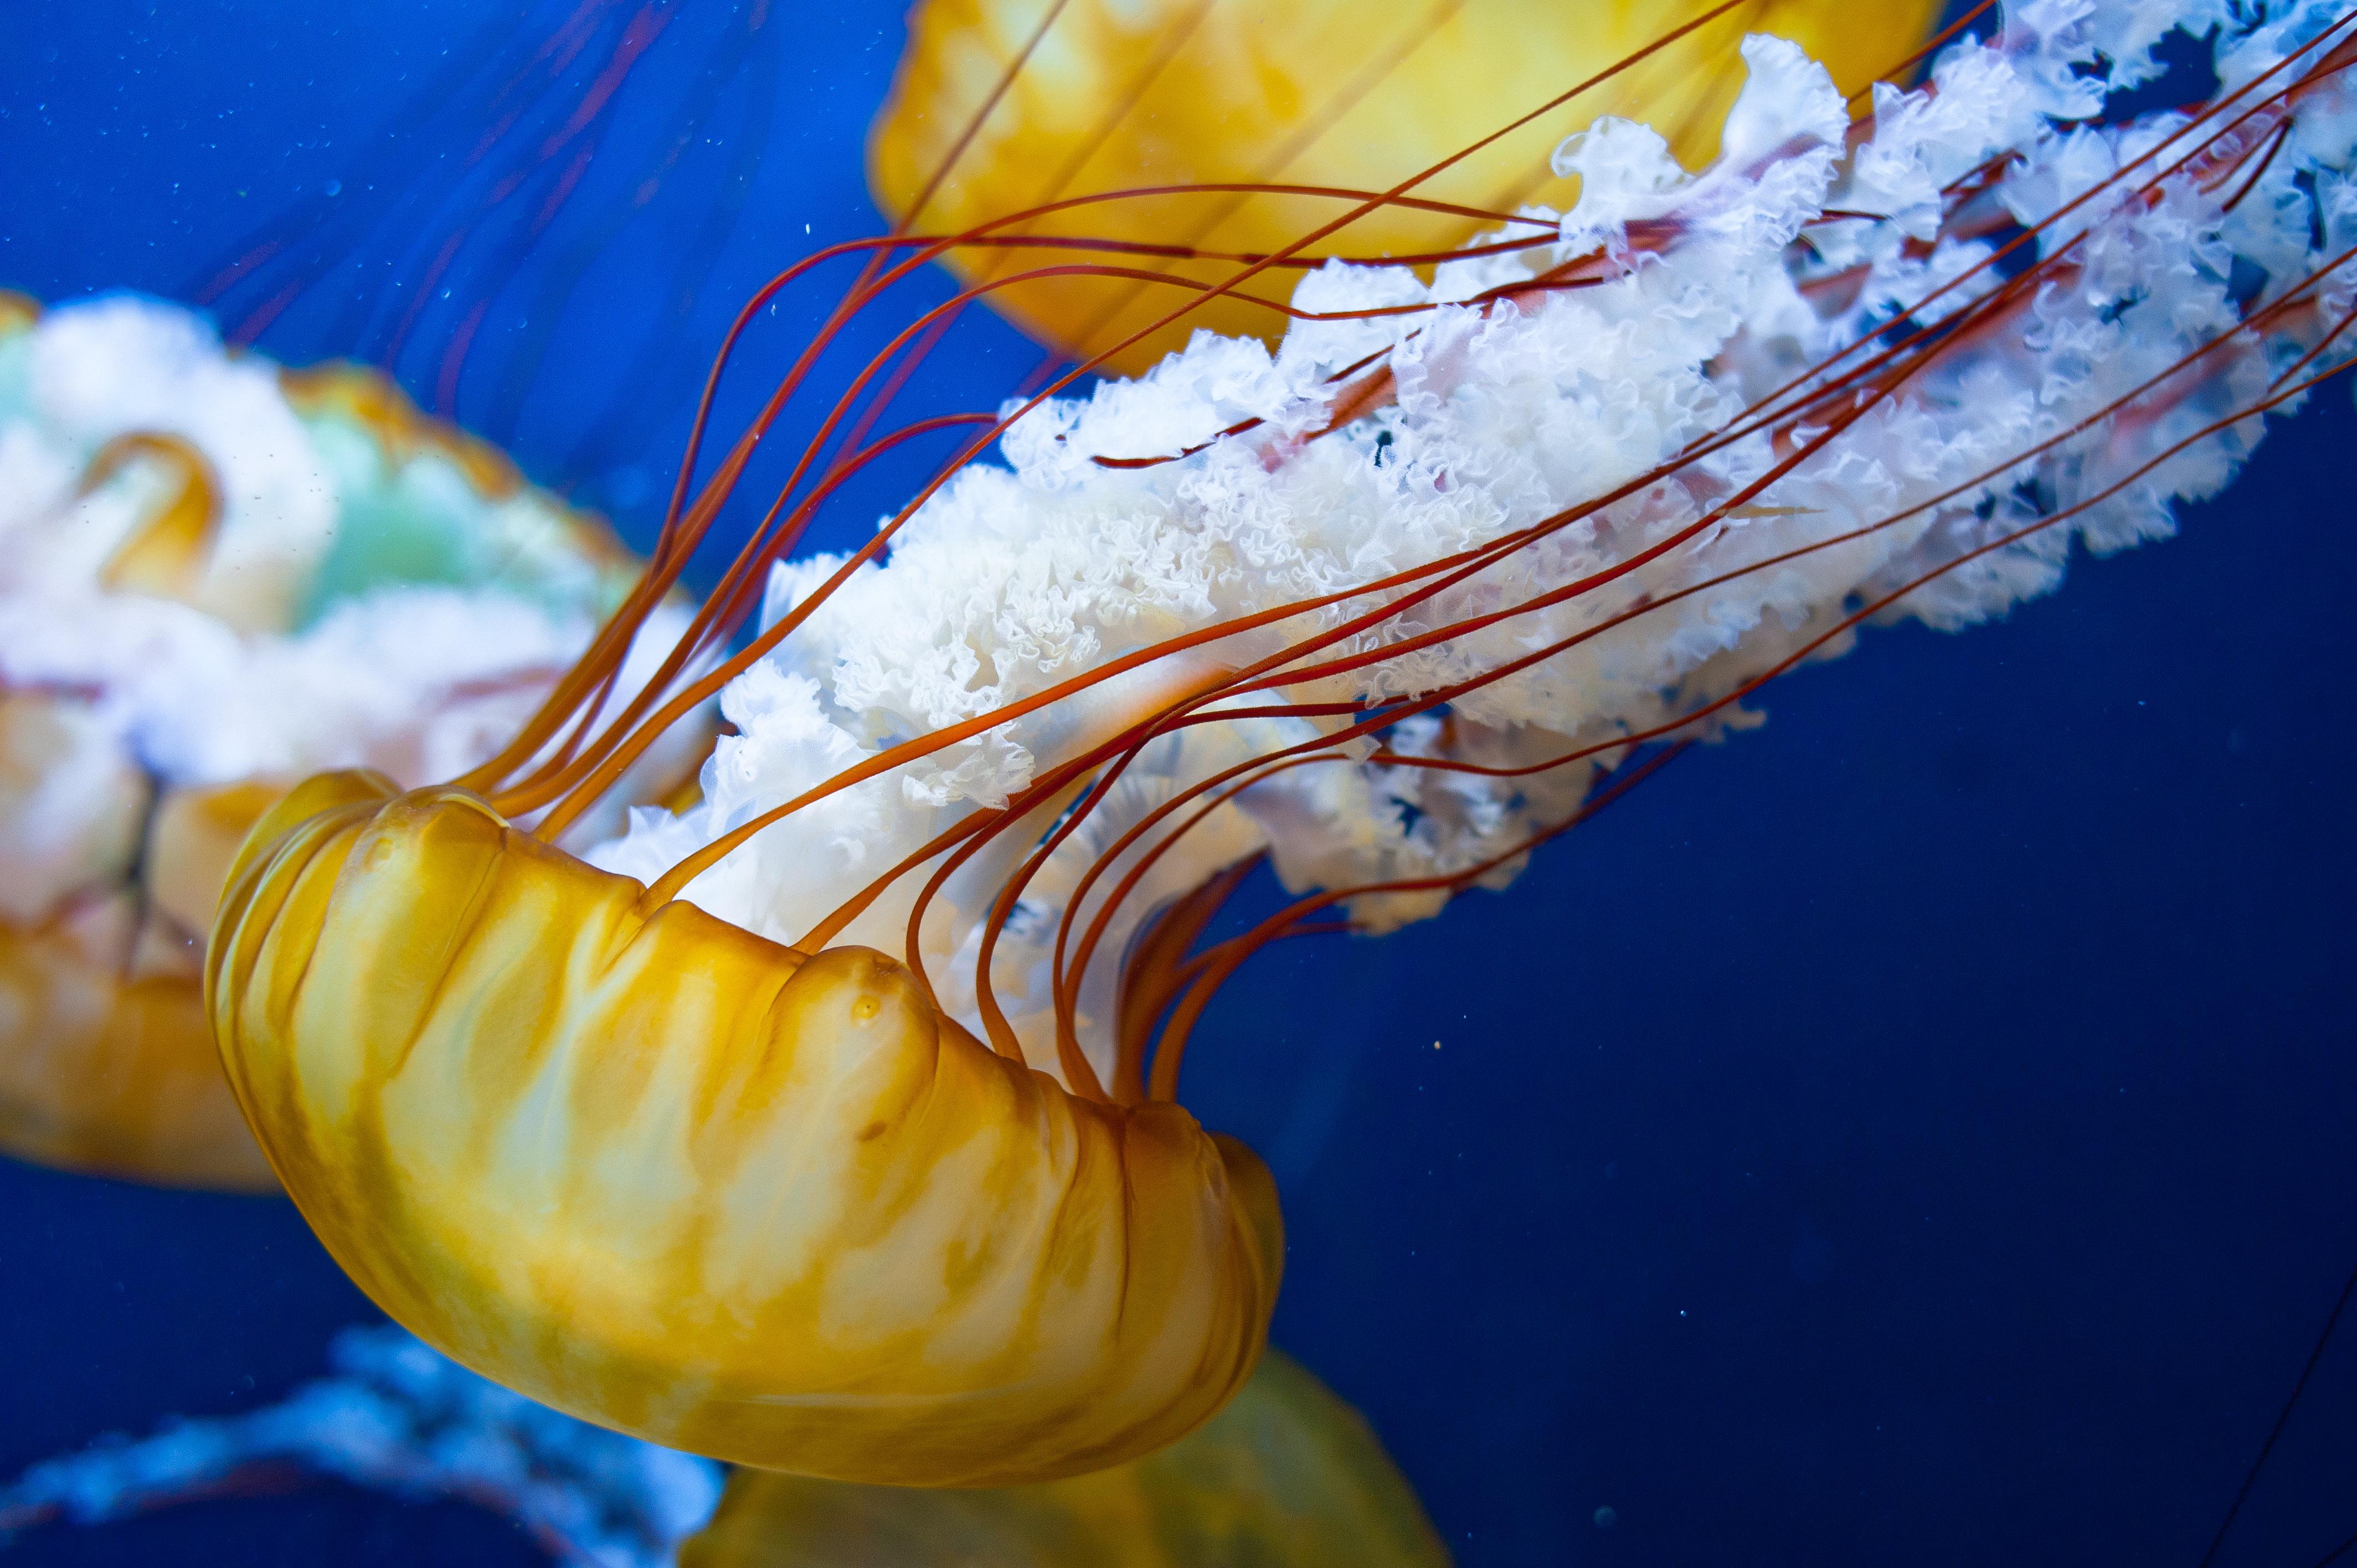 jellyfish venom capsule length association with pain